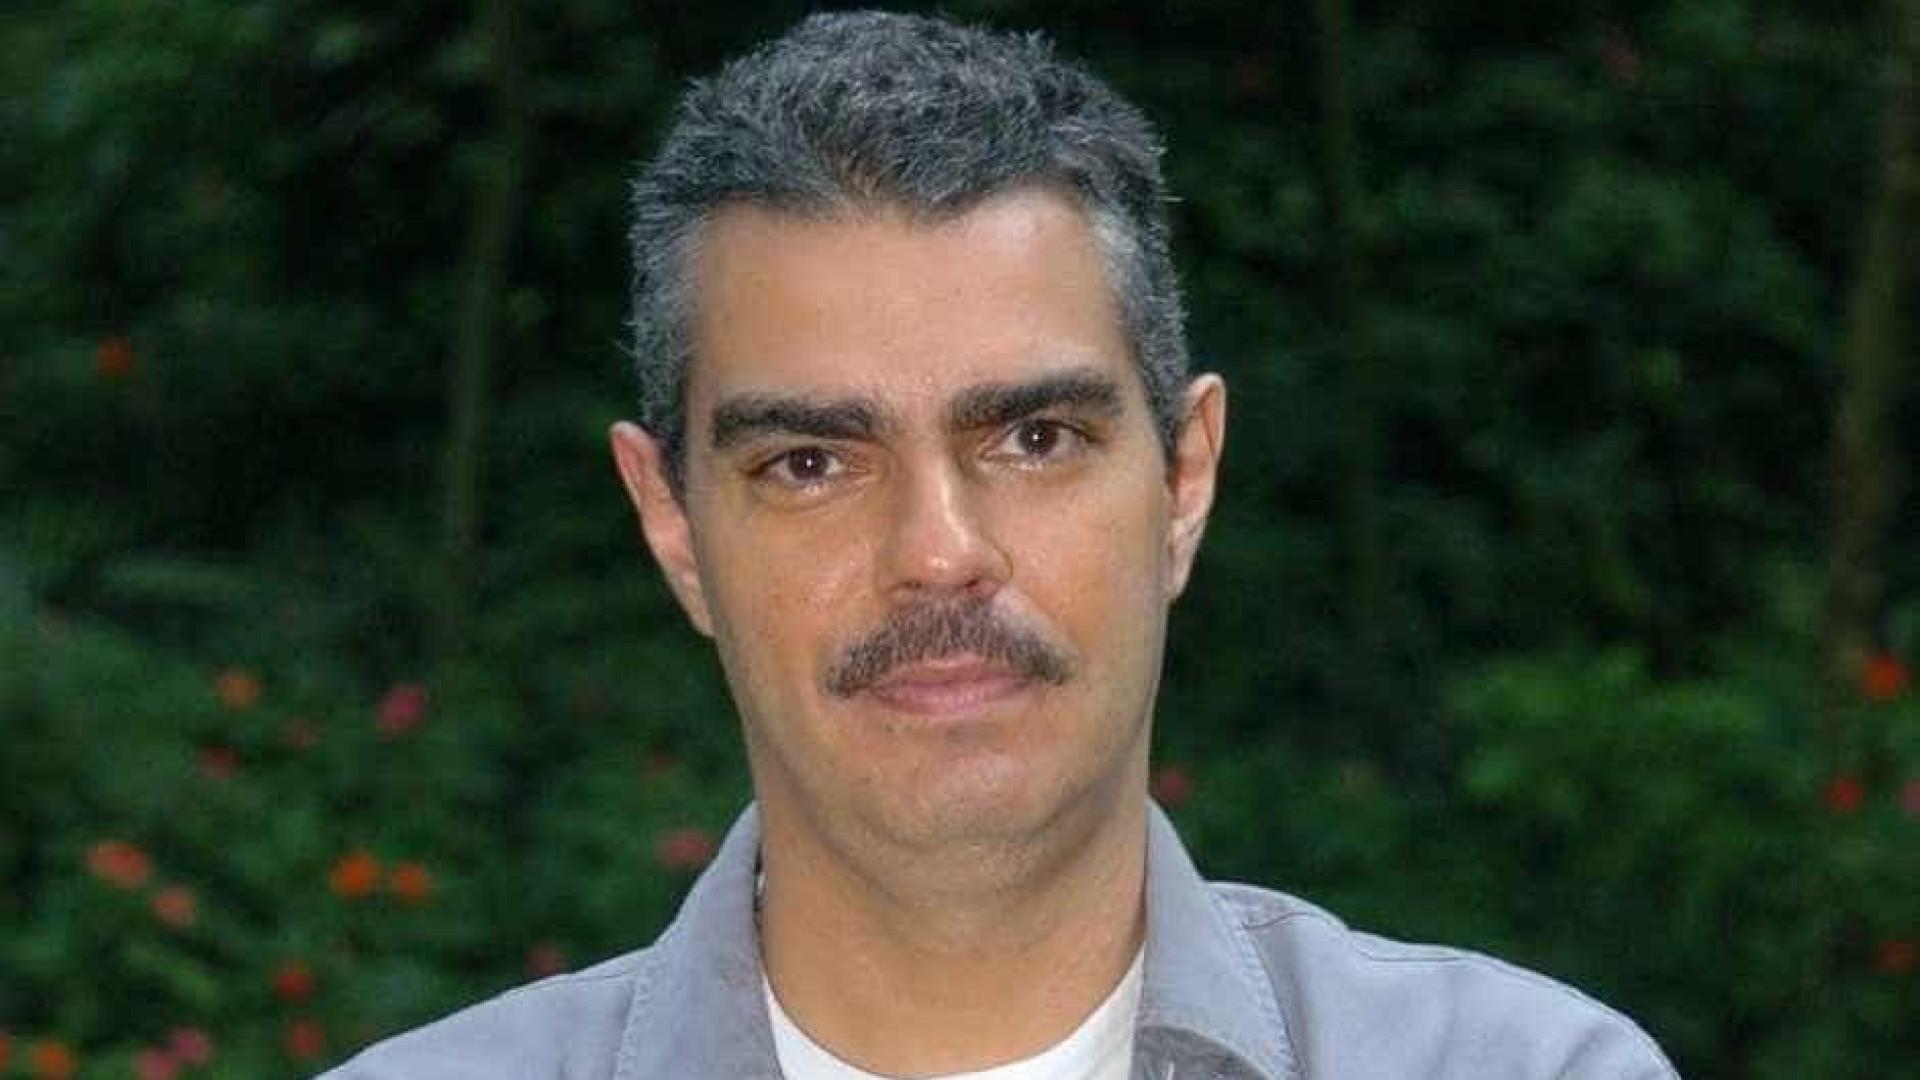 Filho de Chico Anysio, Nizo Neto deixa Globo após 40 anos